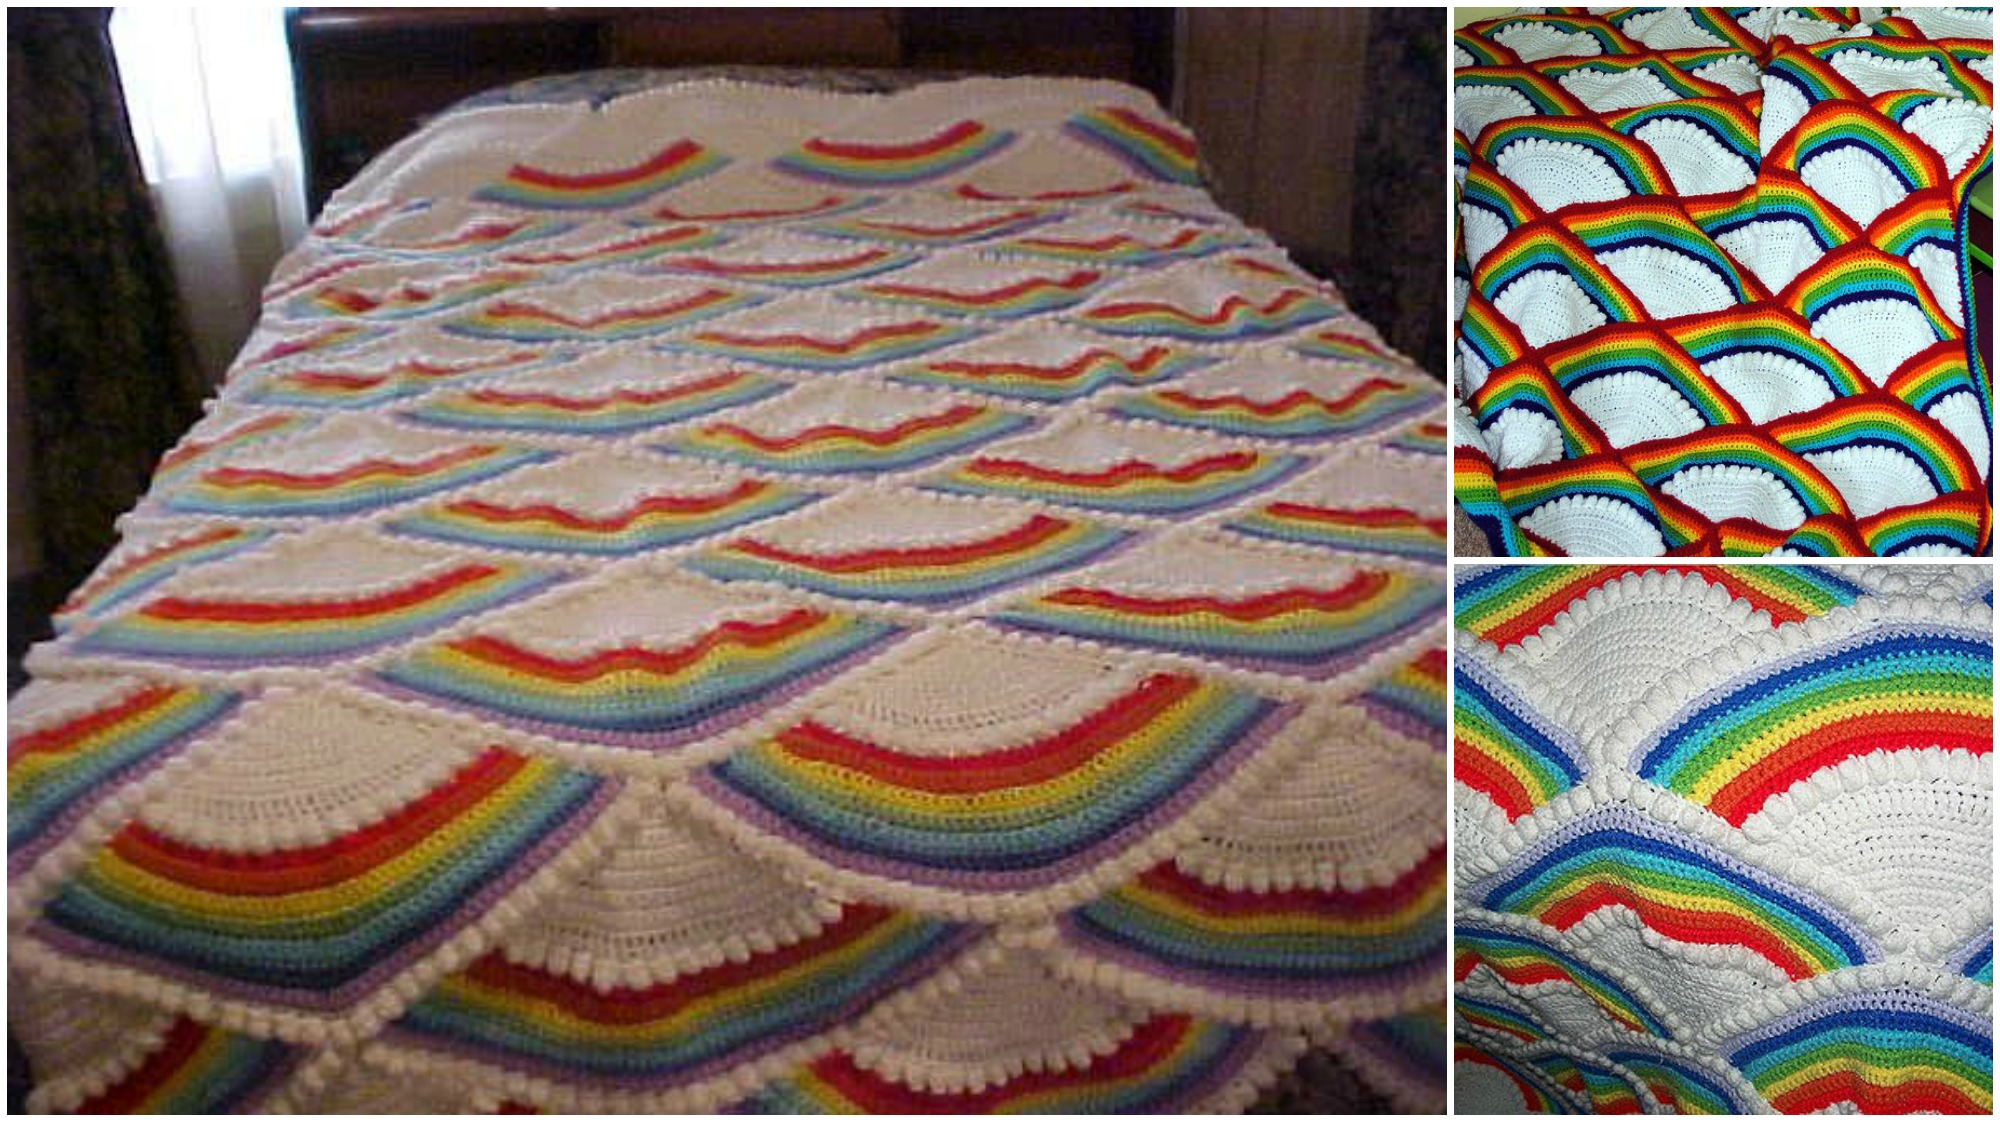 Cobertor de arco-íris